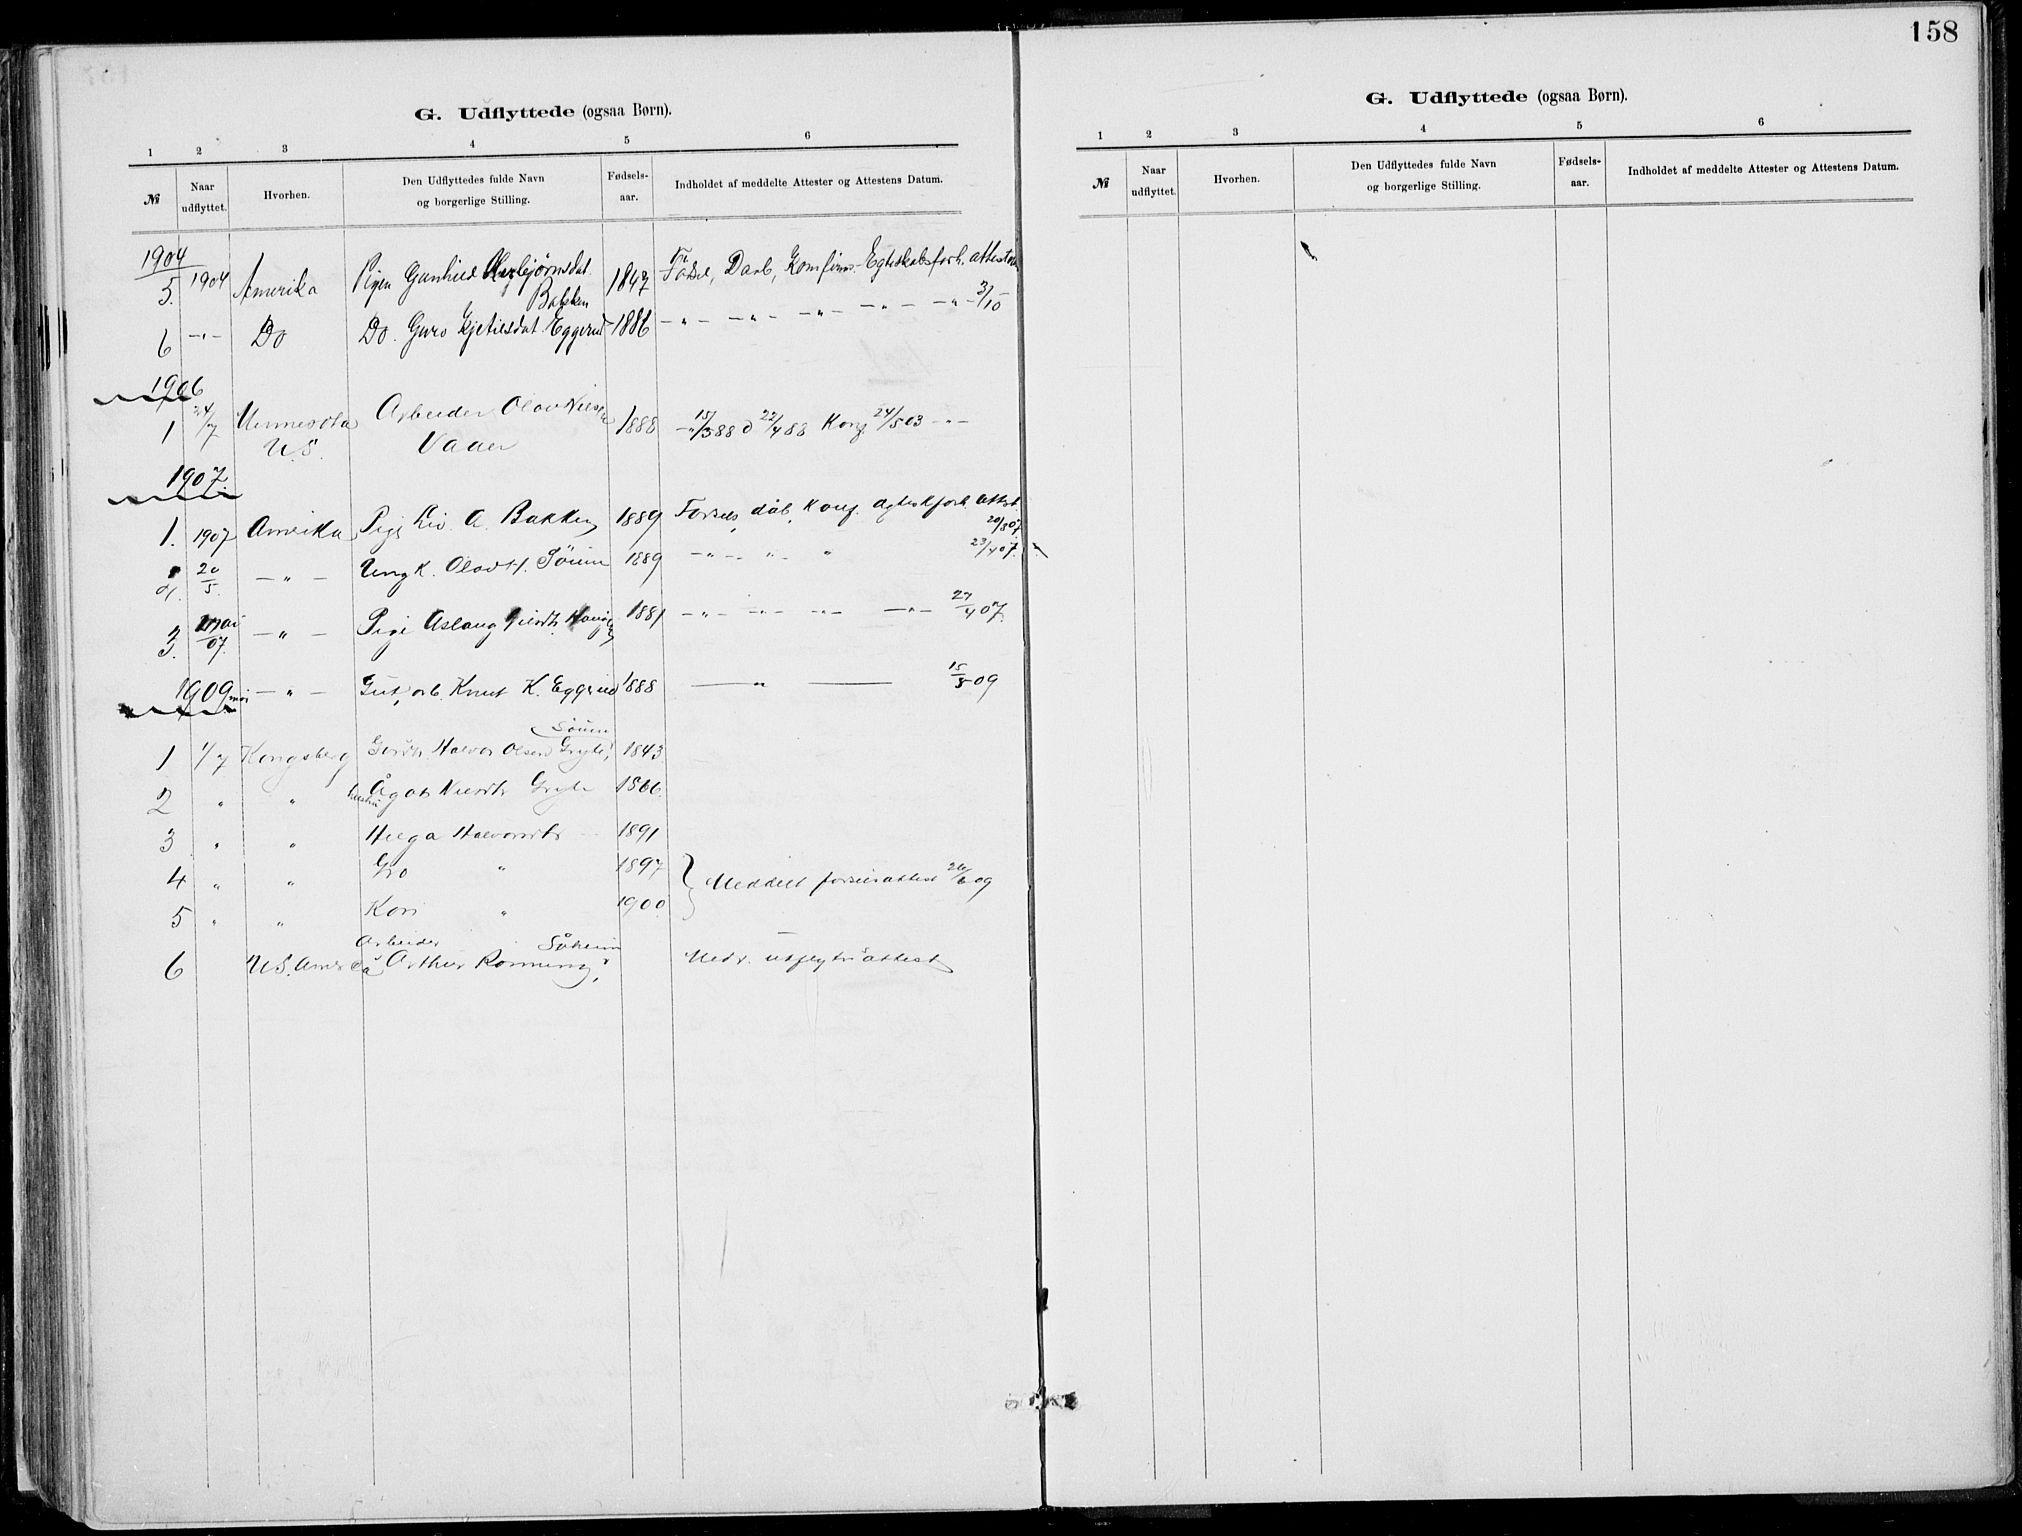 SAKO, Rjukan kirkebøker, F/Fa/L0001: Ministerialbok nr. 1, 1878-1912, s. 158